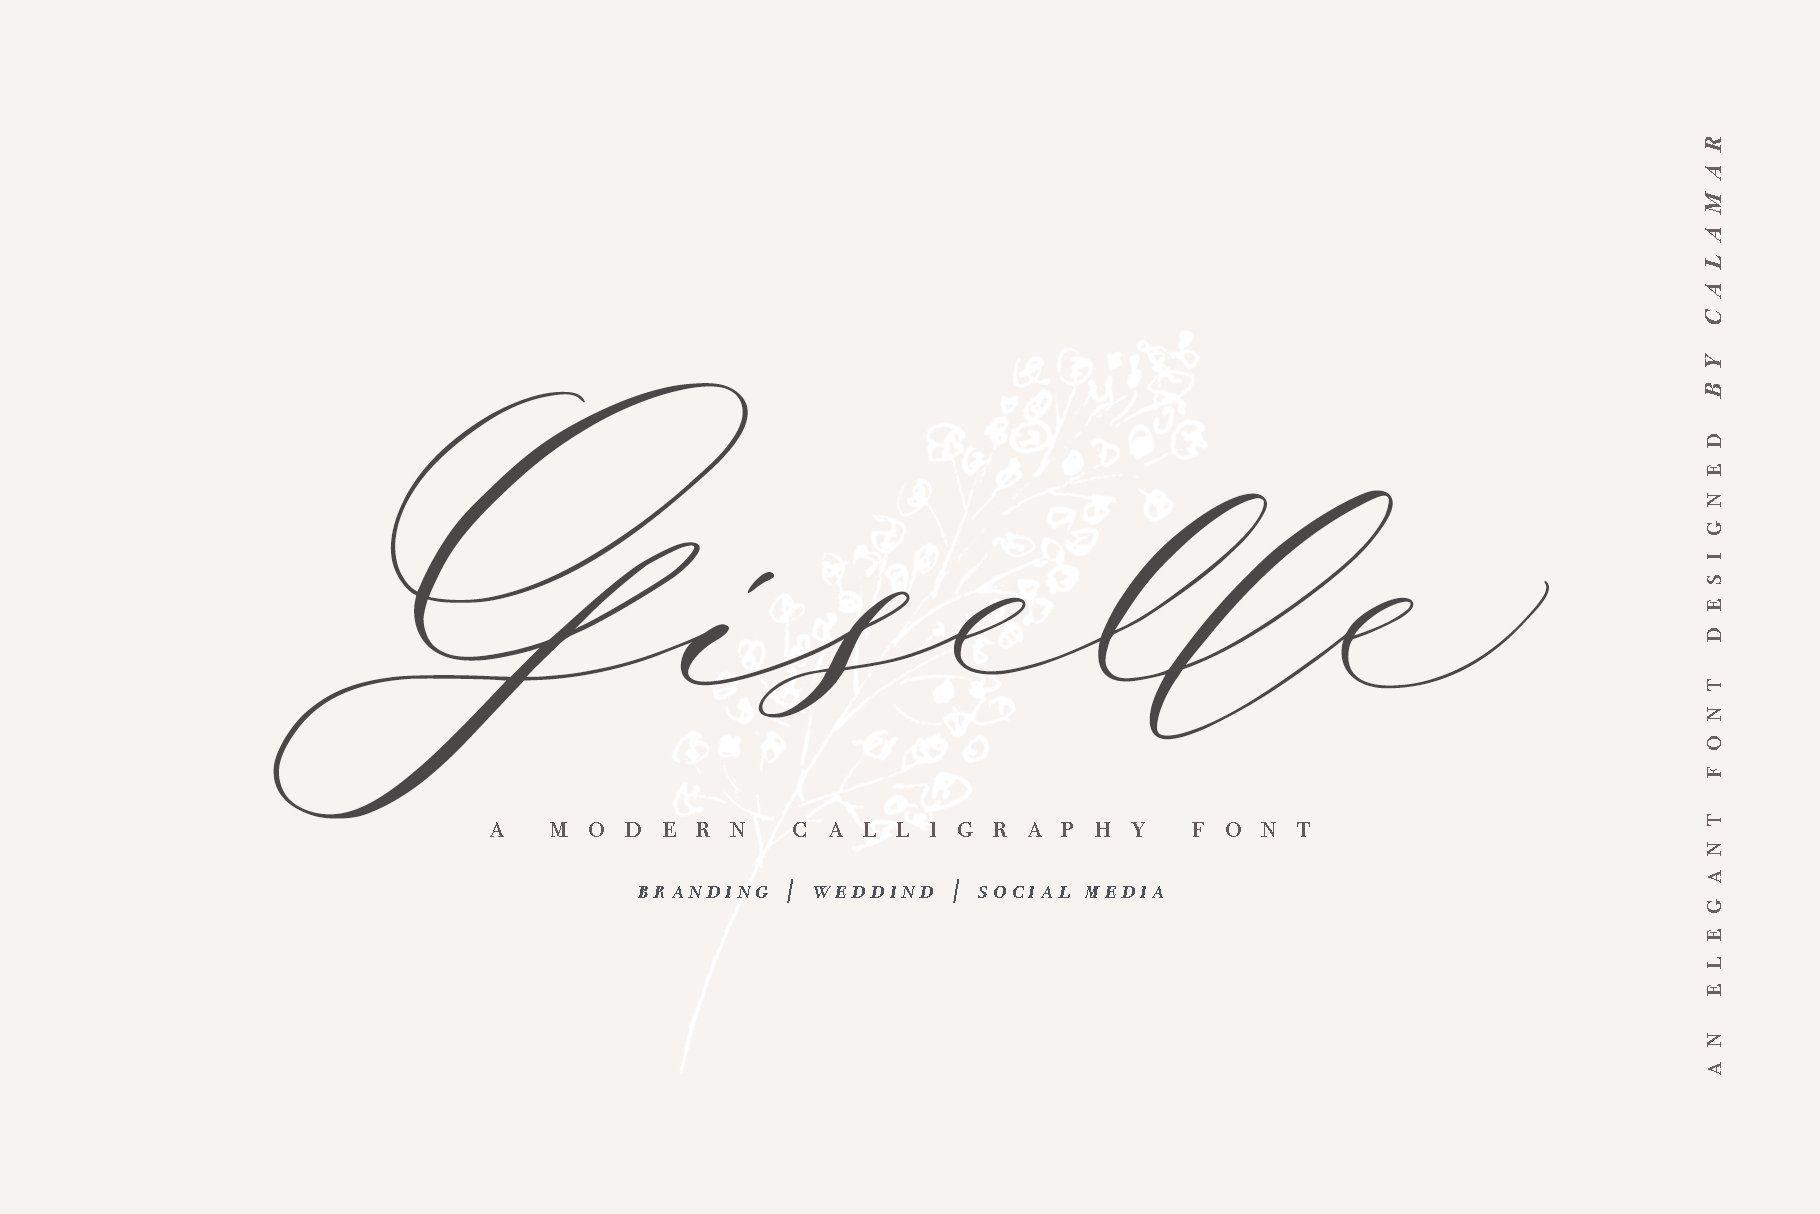 Giselle Script Modern Calligraphy Fonts Wedding Fonts Script